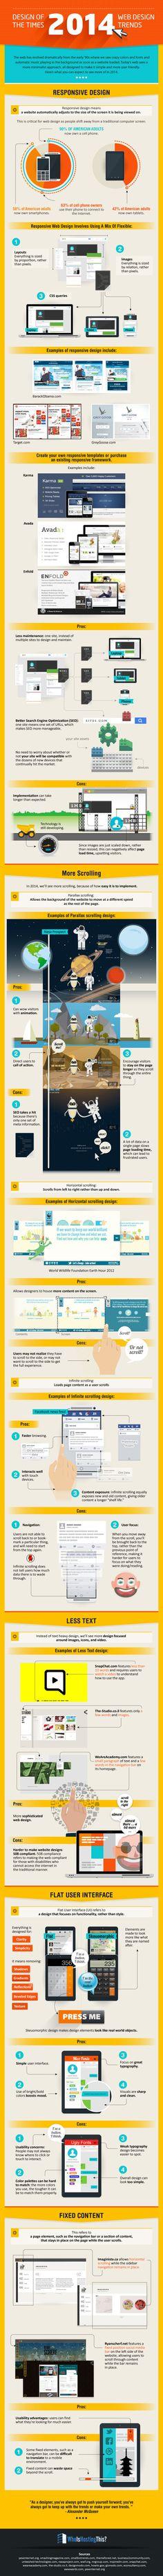 #Web #Design #Trends 2014 #infographic #infografia